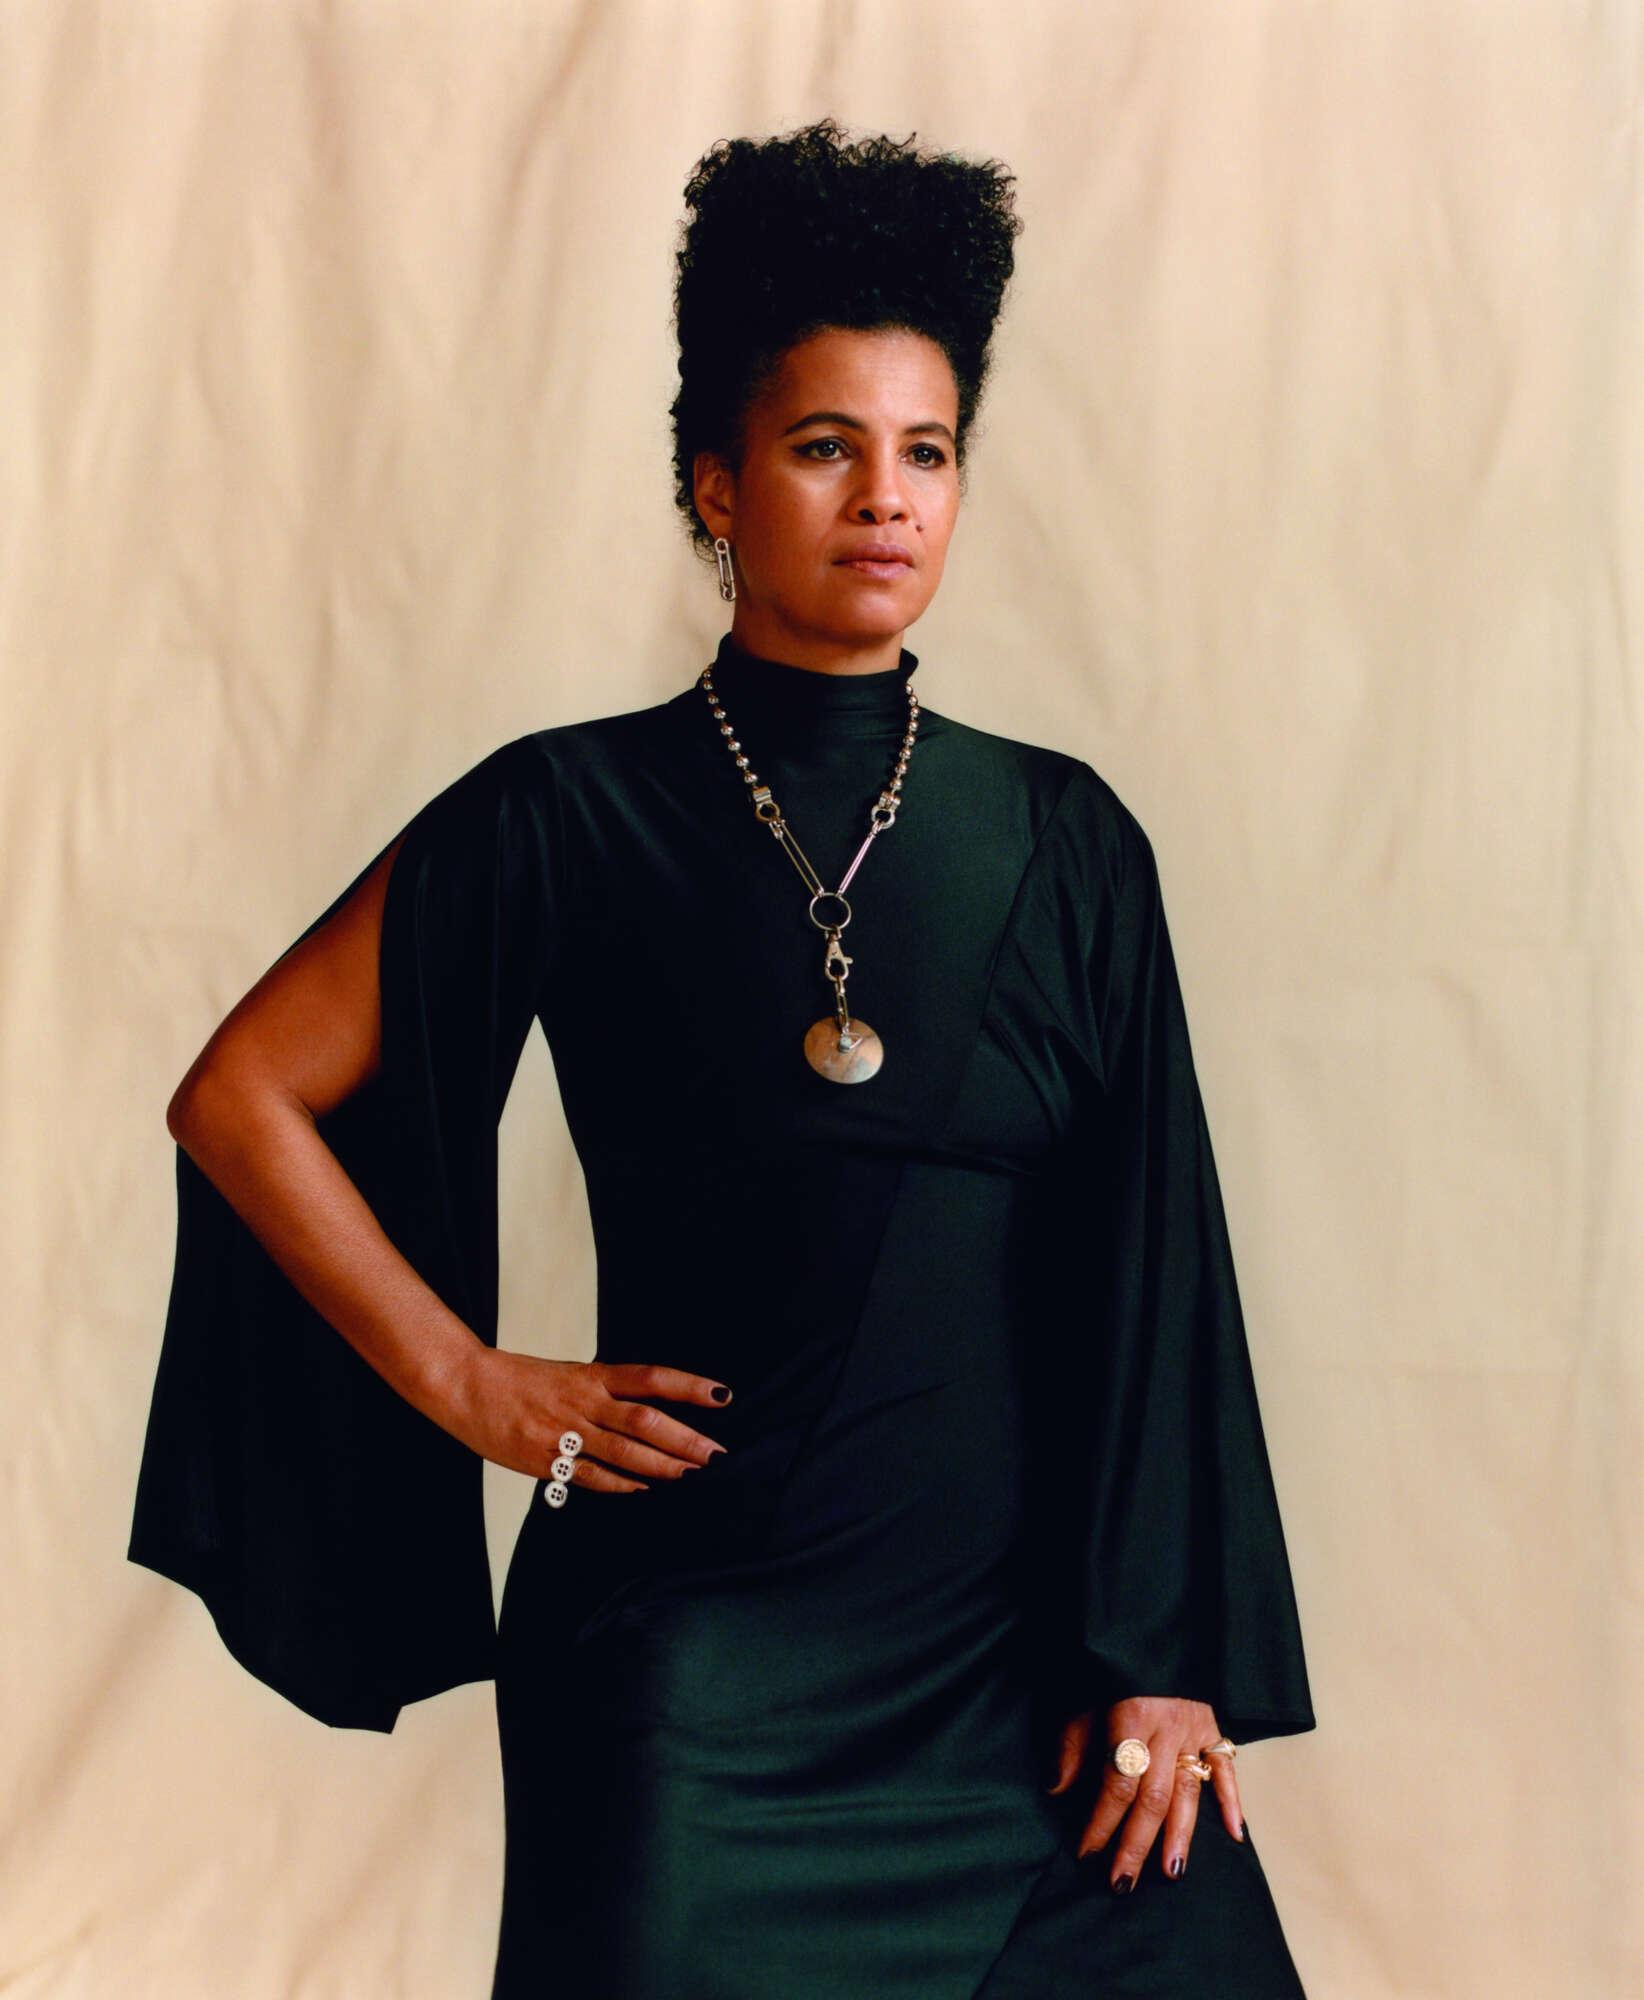 NENEH wears AMBUSH dress from MACHINE-A, JUDY BLAME necklace.